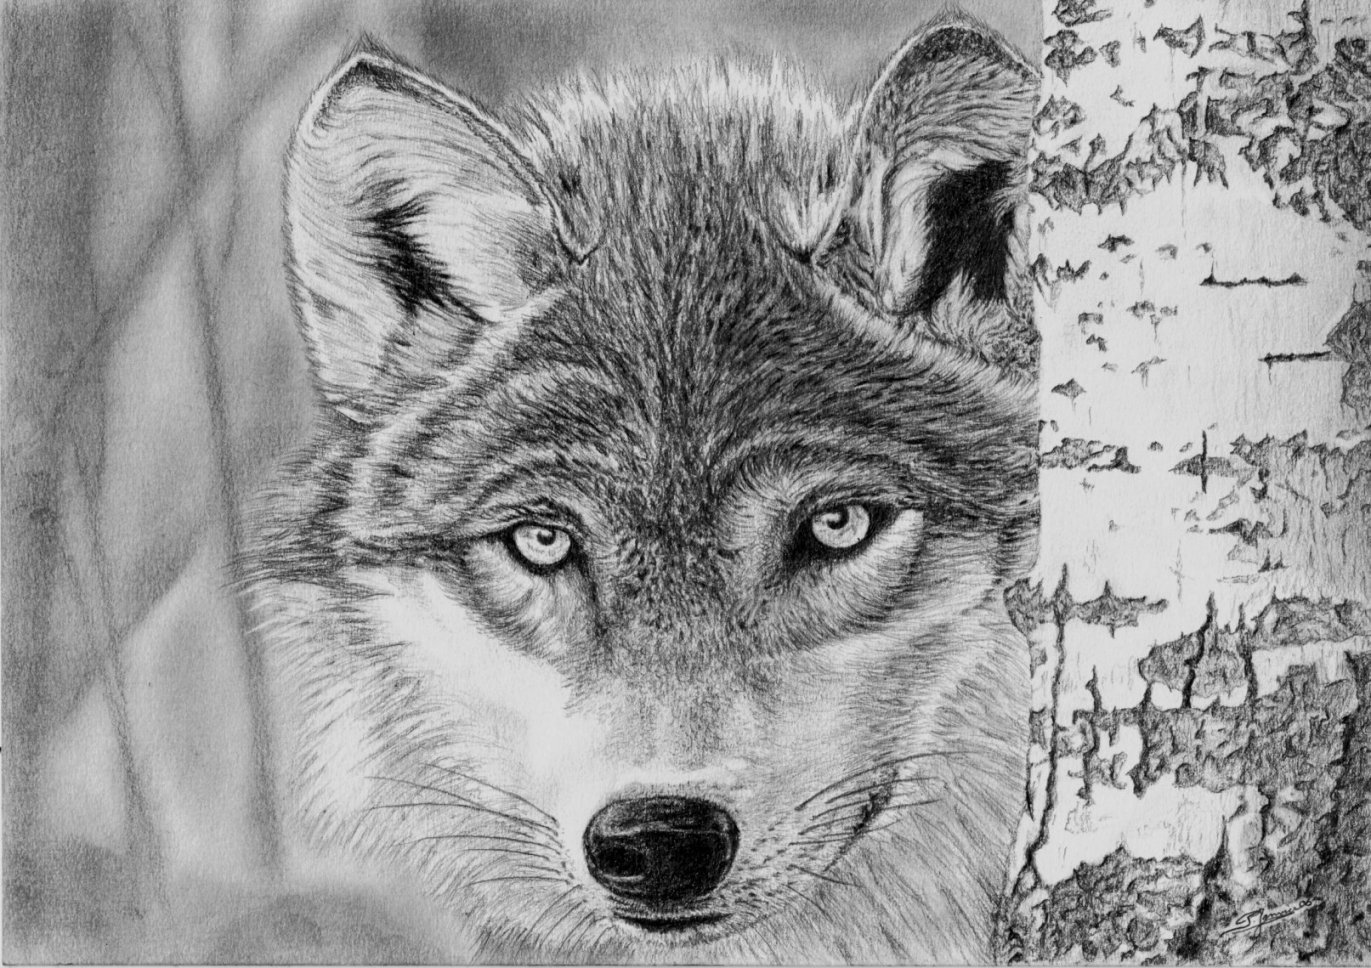 Dessin loup l 39 affut - Un loup dessin ...